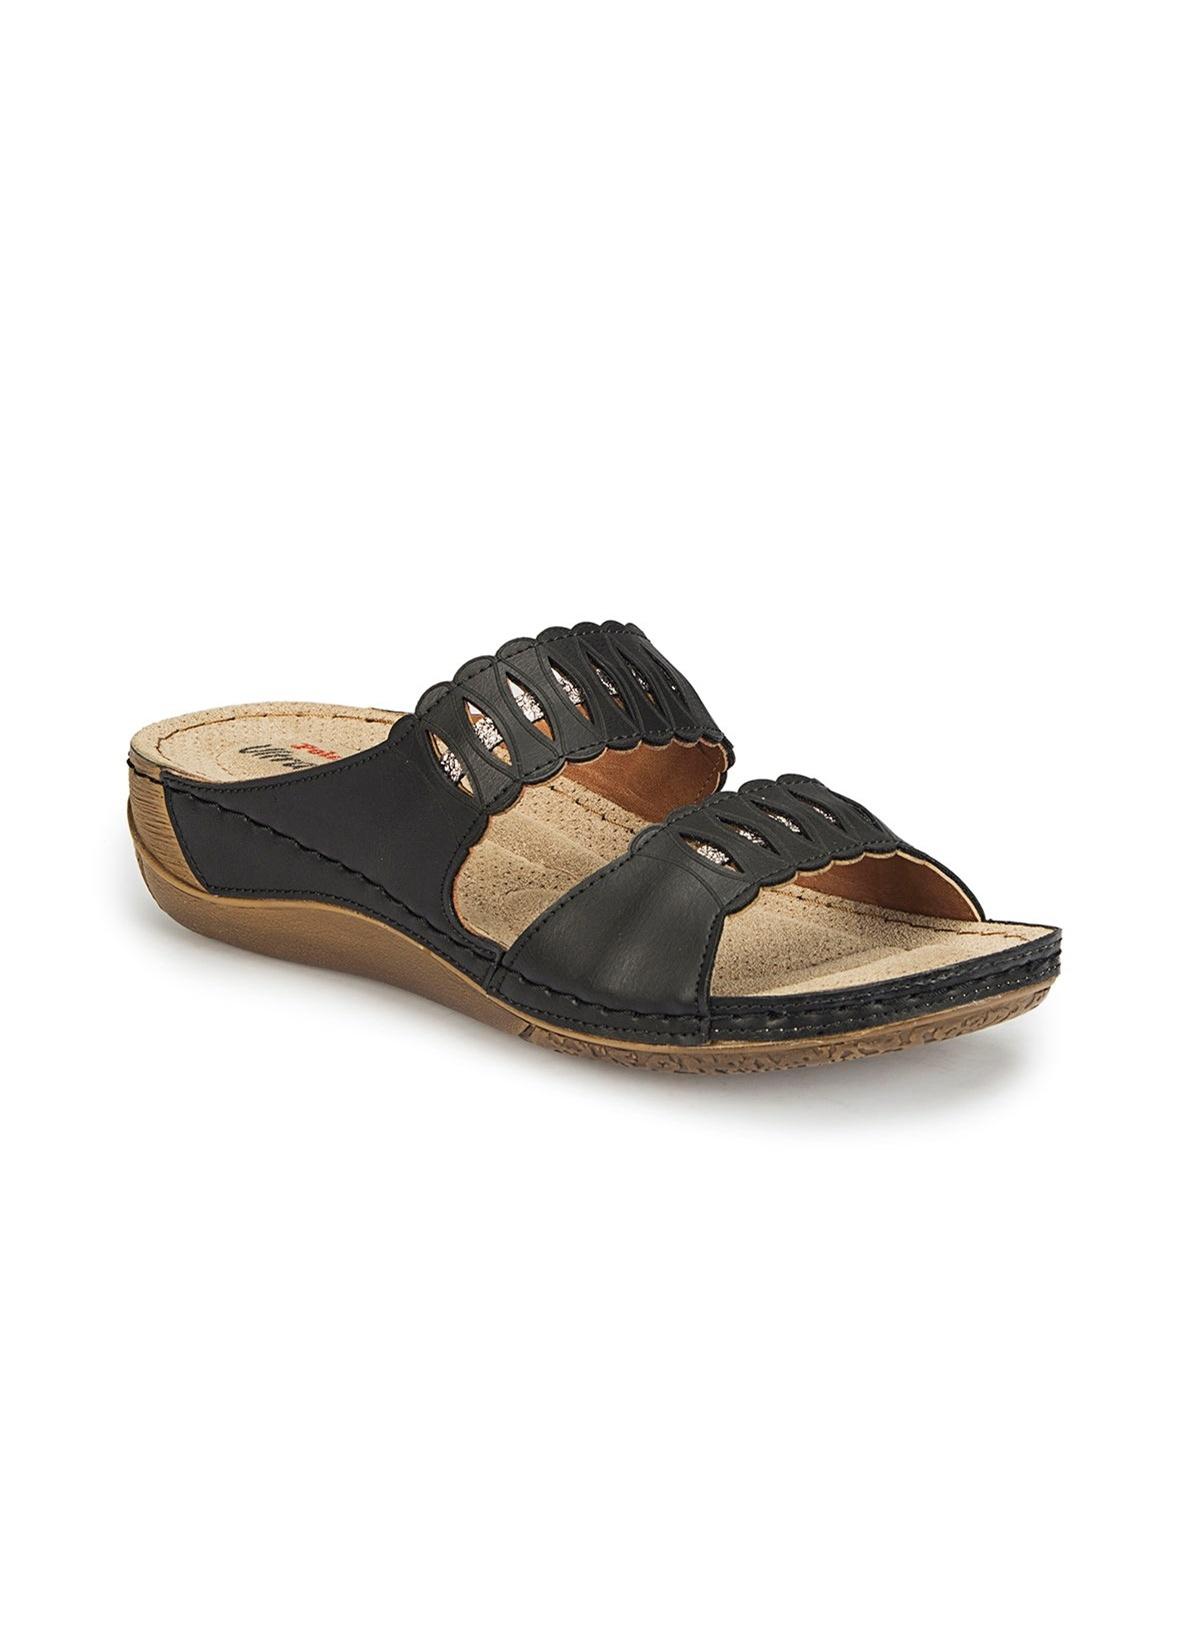 Polaris Sandalet 81.158568.z Basic Comfort – 62.49 TL